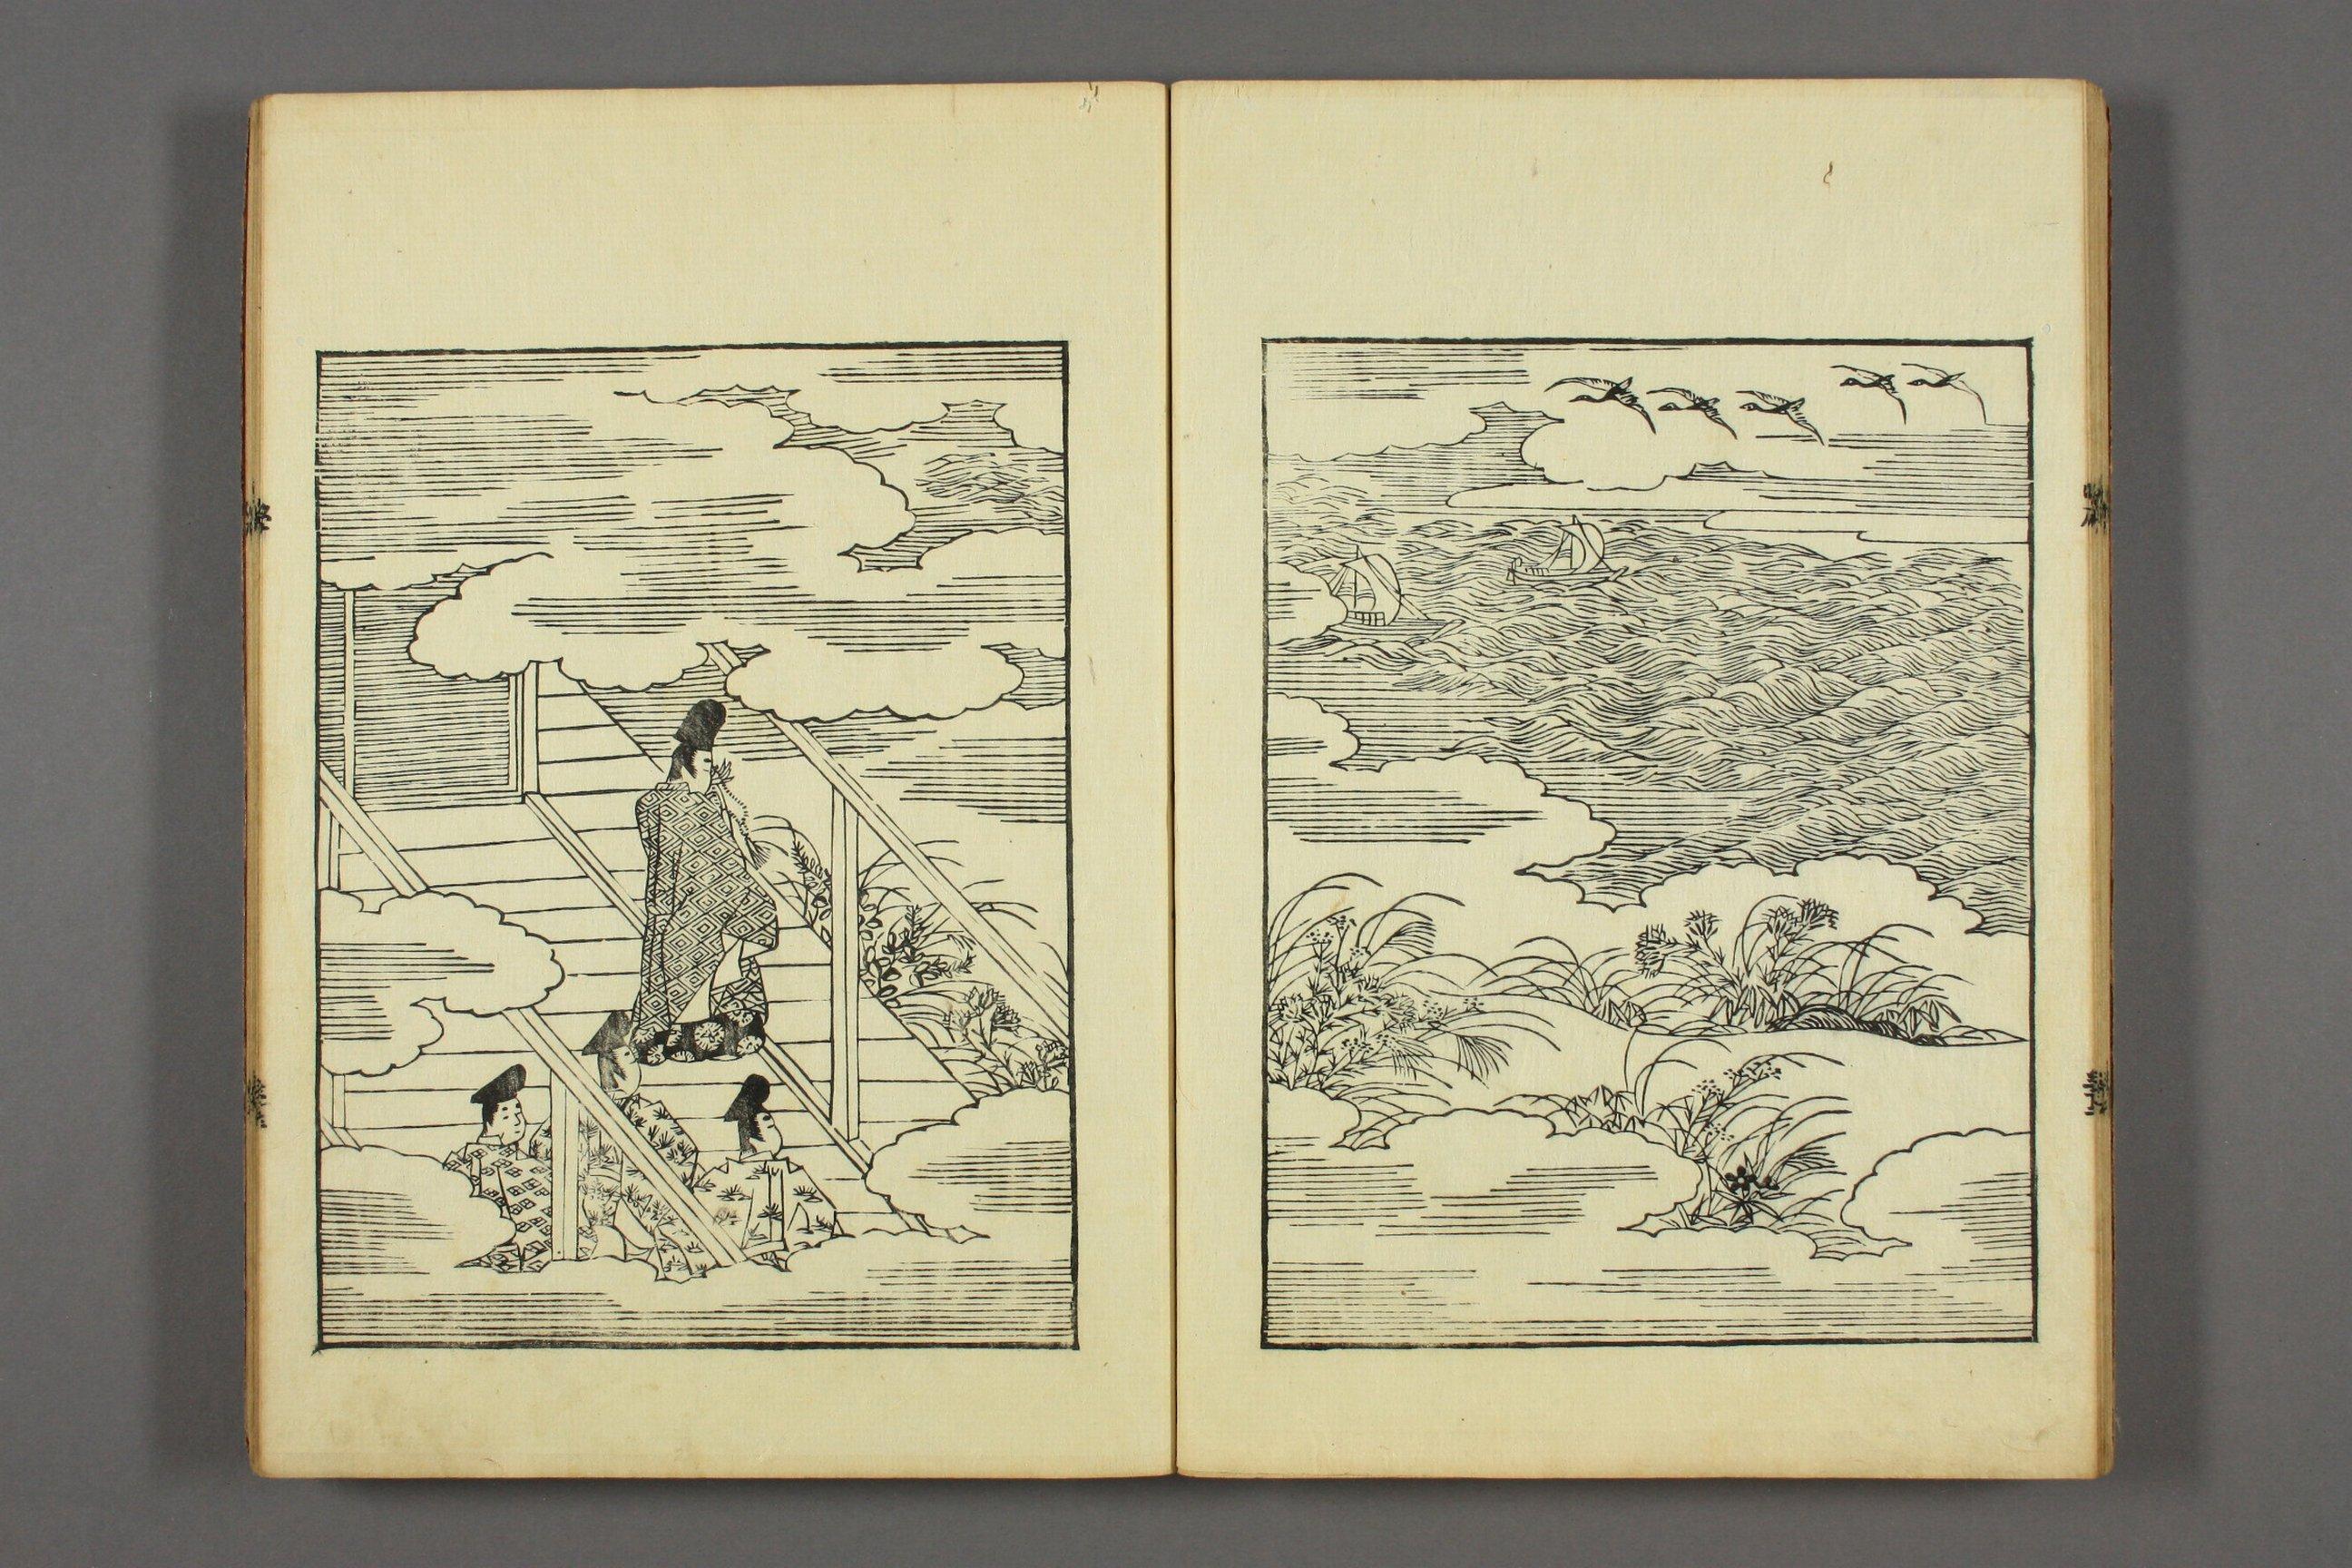 http://archive.wul.waseda.ac.jp/kosho/bunko30/bunko30_a0007/bunko30_a0007_0012/bunko30_a0007_0012_p0034.jpg